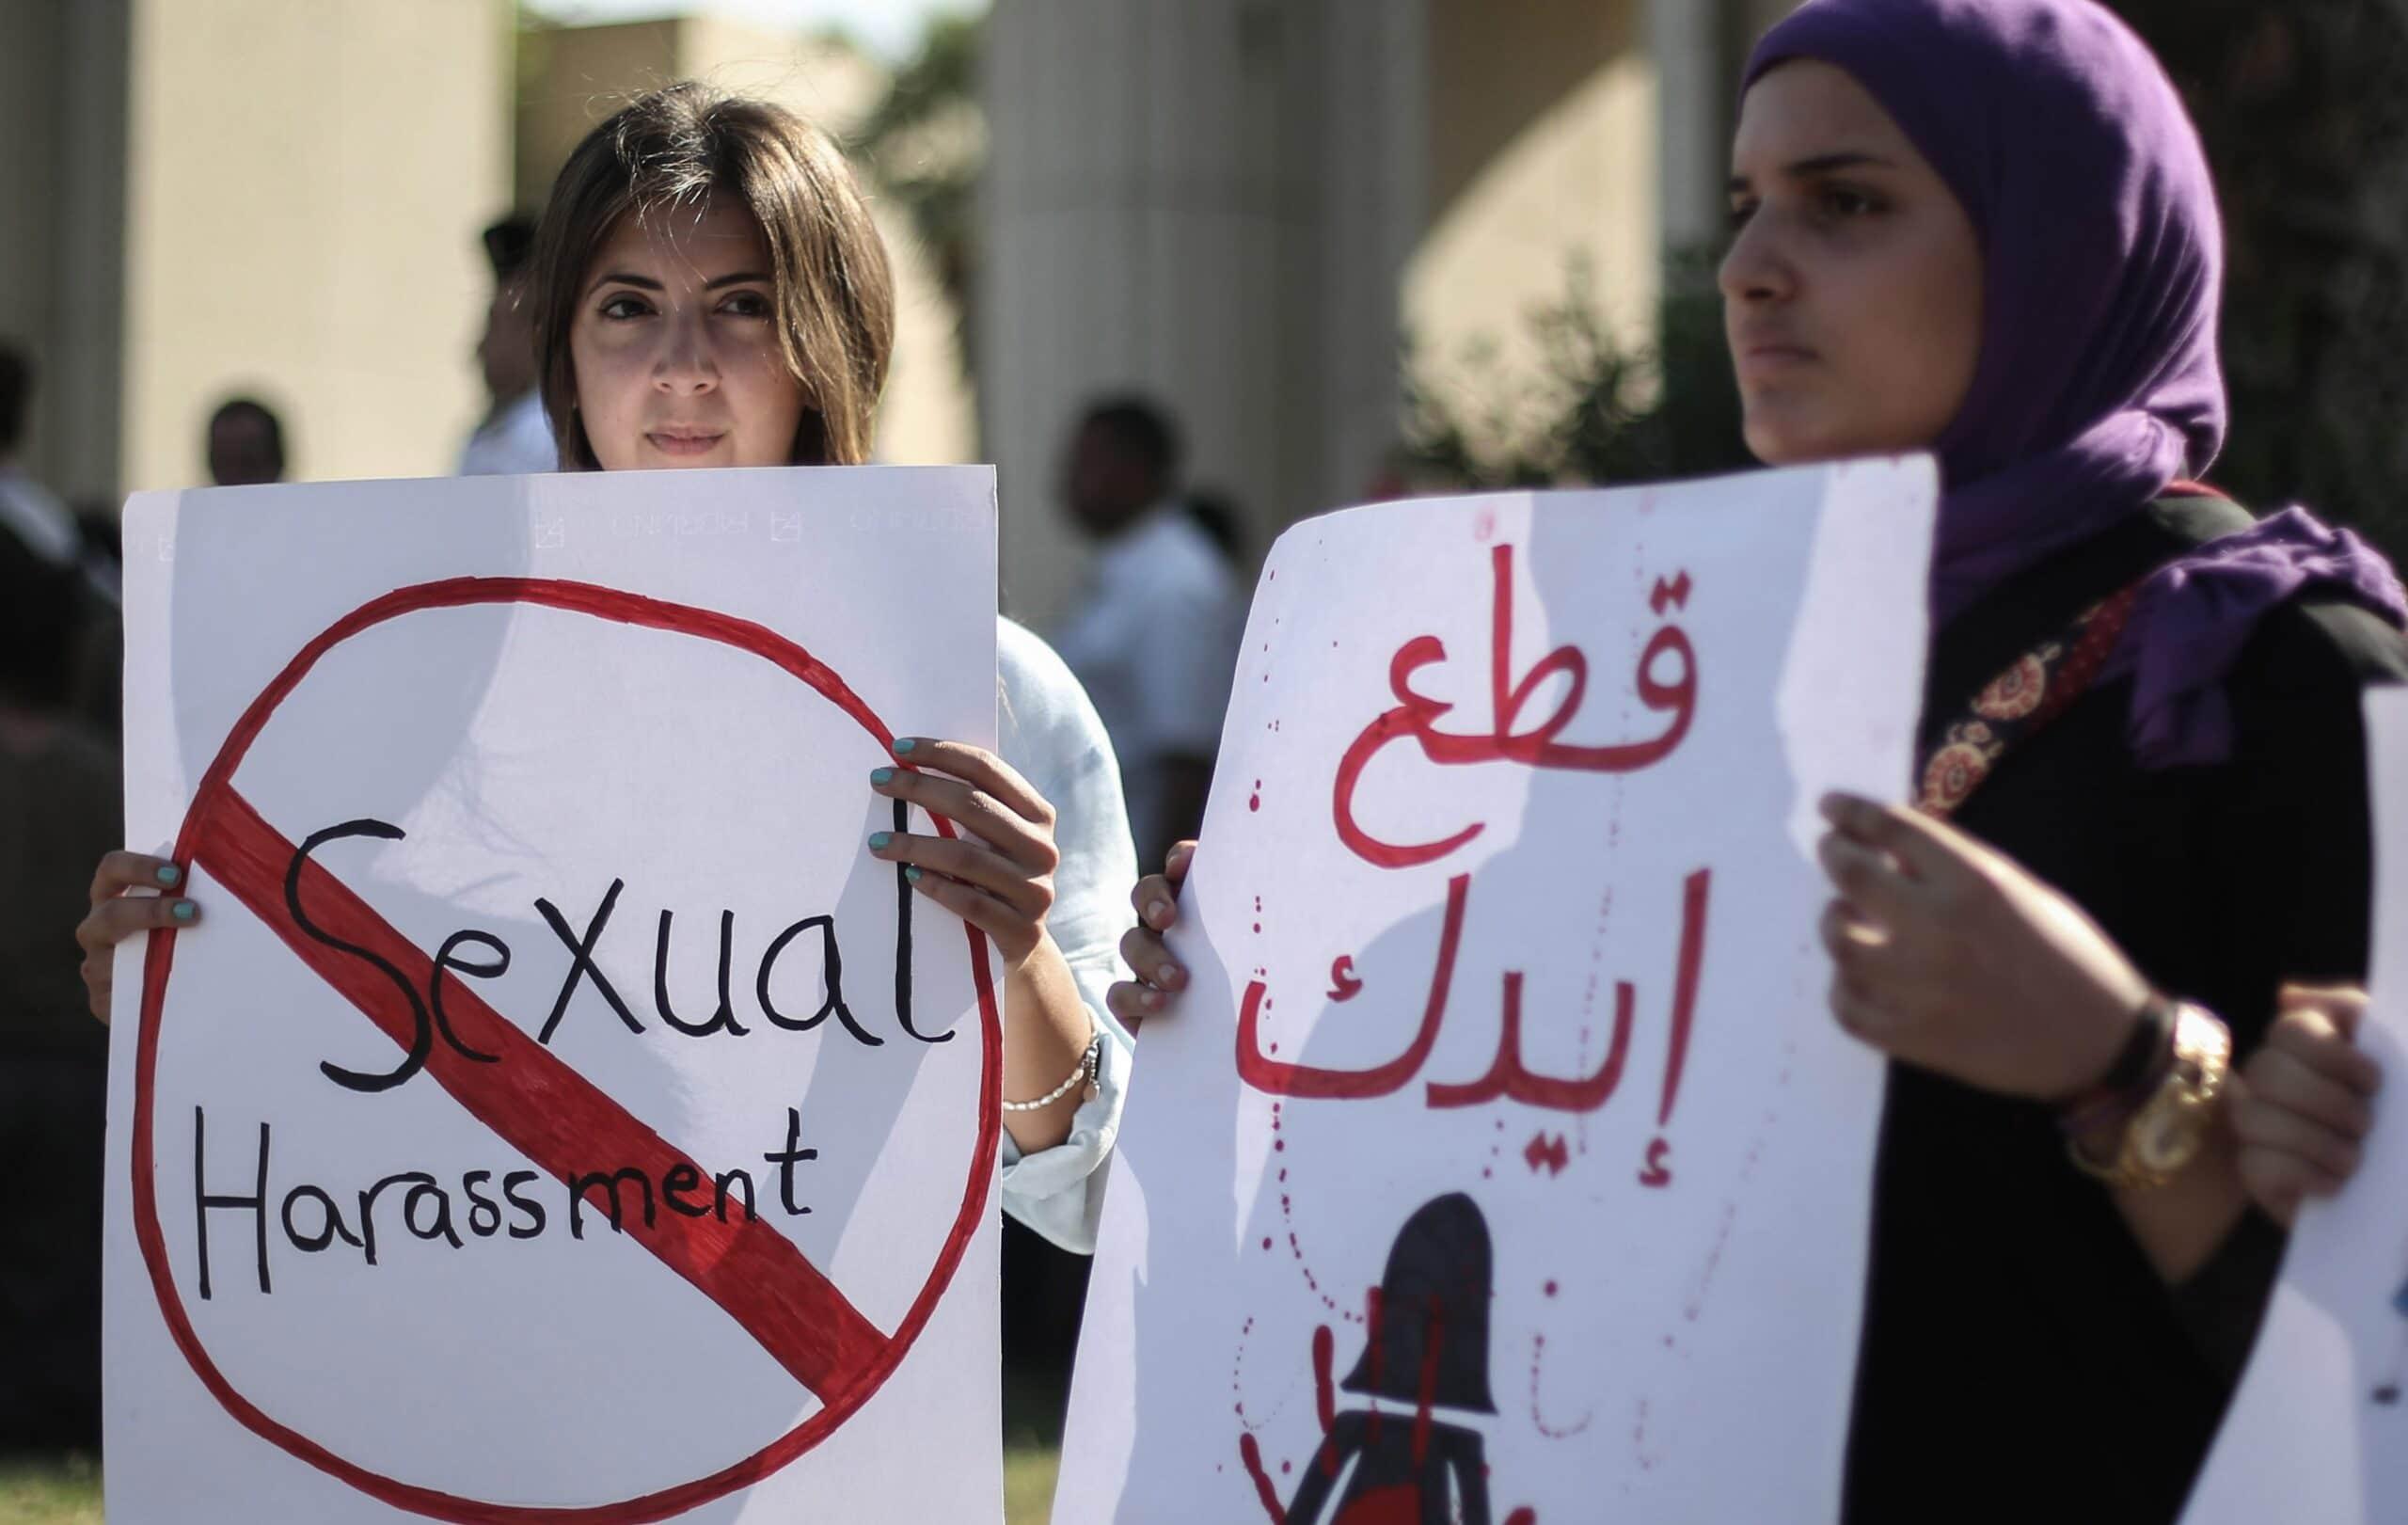 مصر تدرس تغليظ قانون التحرش